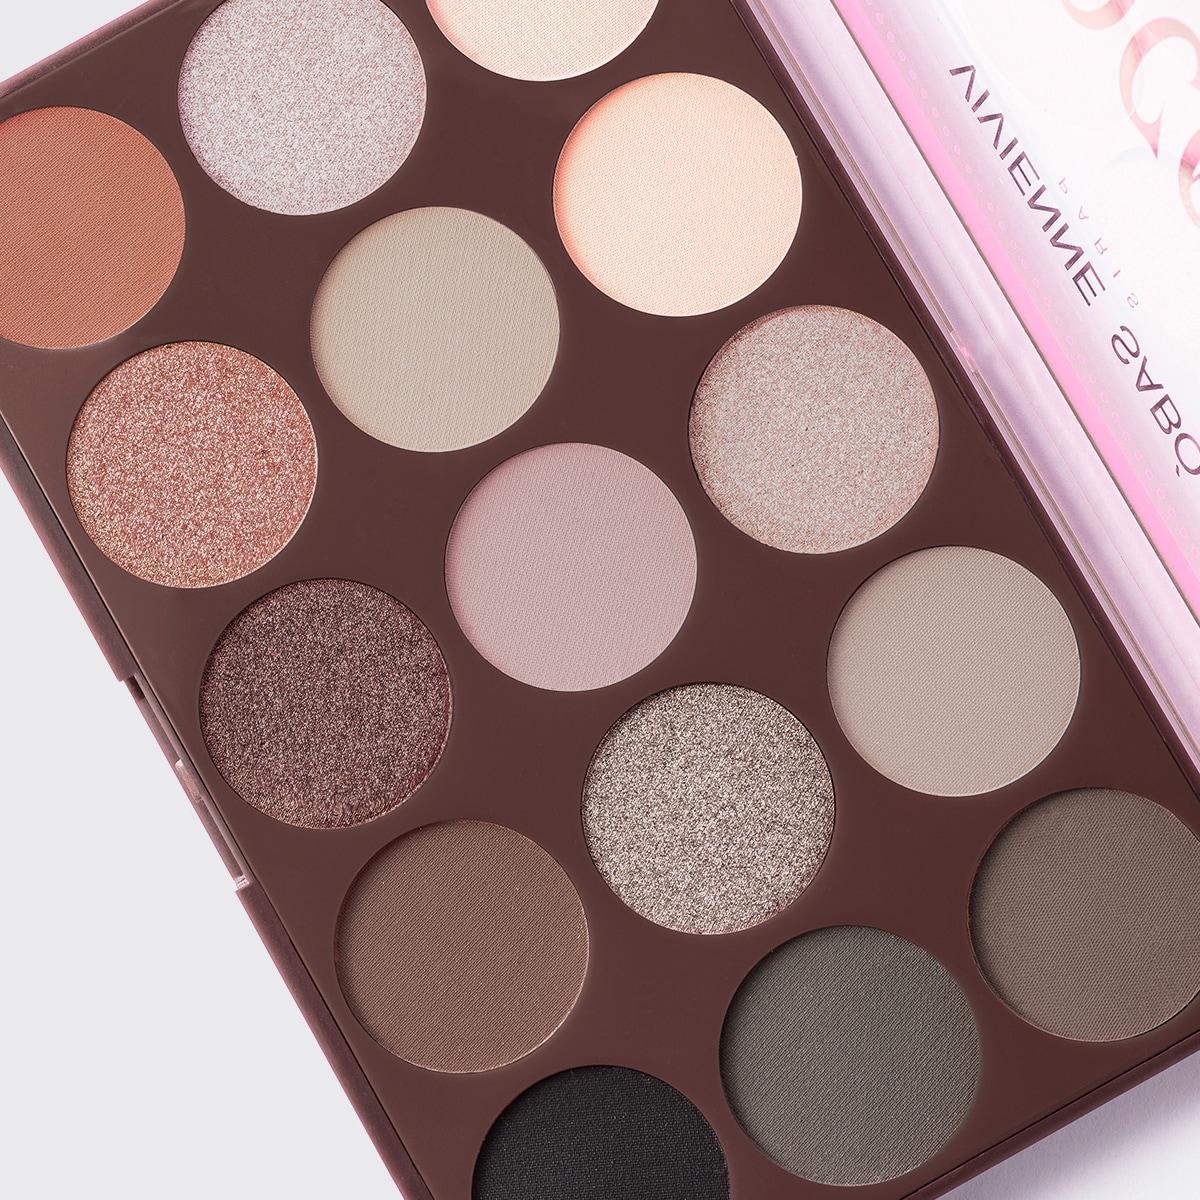 Vivienne Sabo - Eyeshadow Palette Chocolate Bonbons